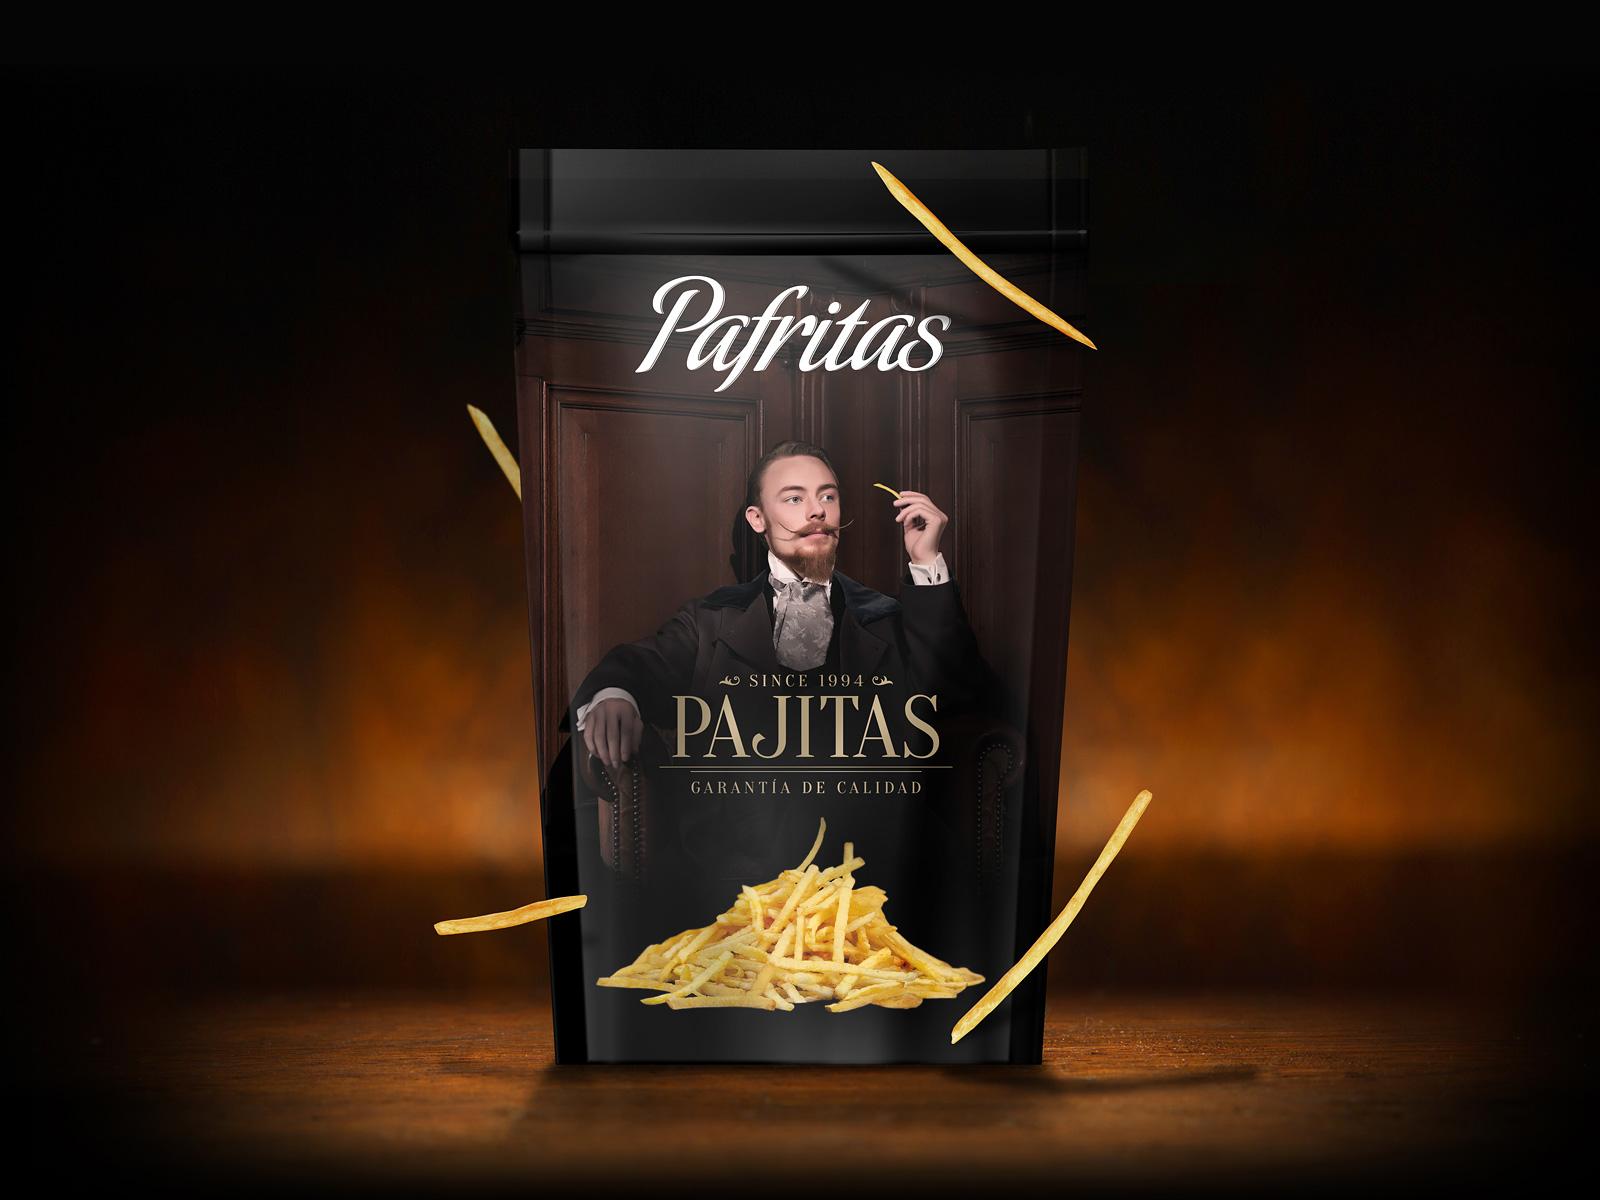 Pafritas_Patas_fritas_en_aceite_de_oliva_Pajitas_Pafritas_Real